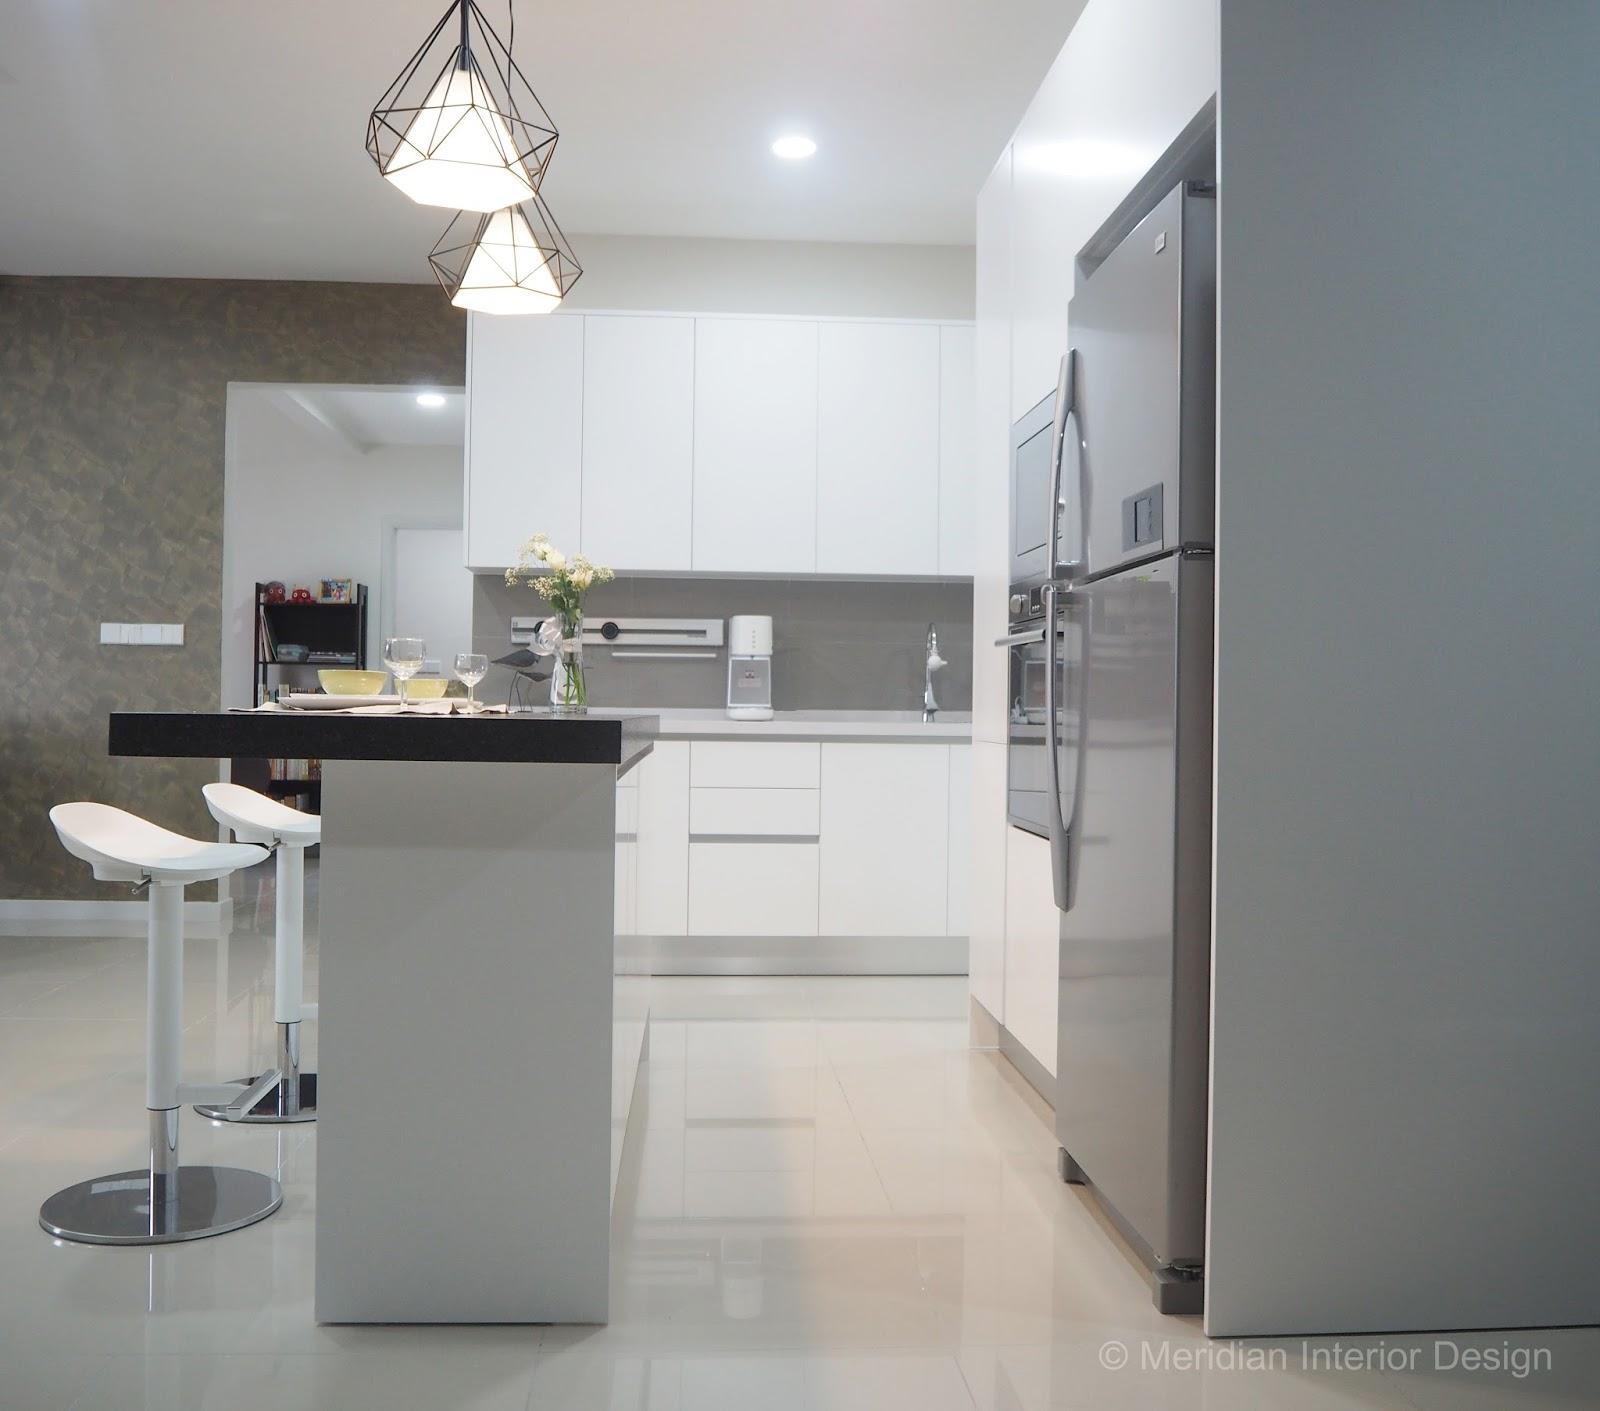 Dry And Wet Kitchen Design Photos: Kitchen Cabinet And Interior Design Blog